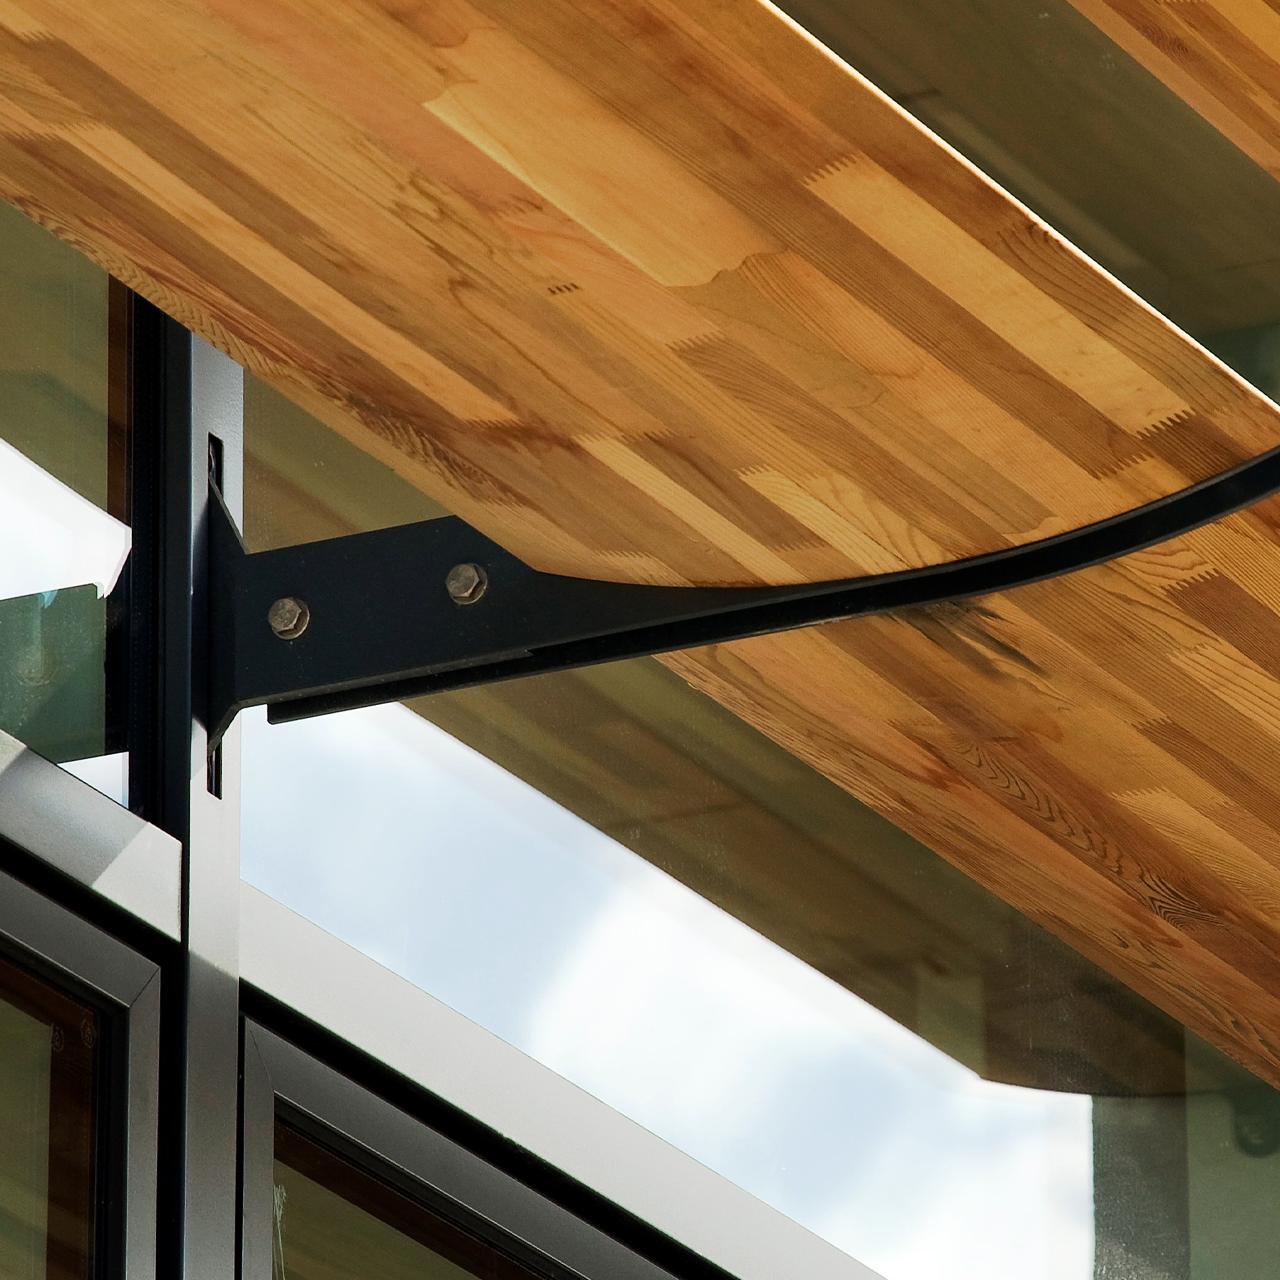 discreet aluminium fins system